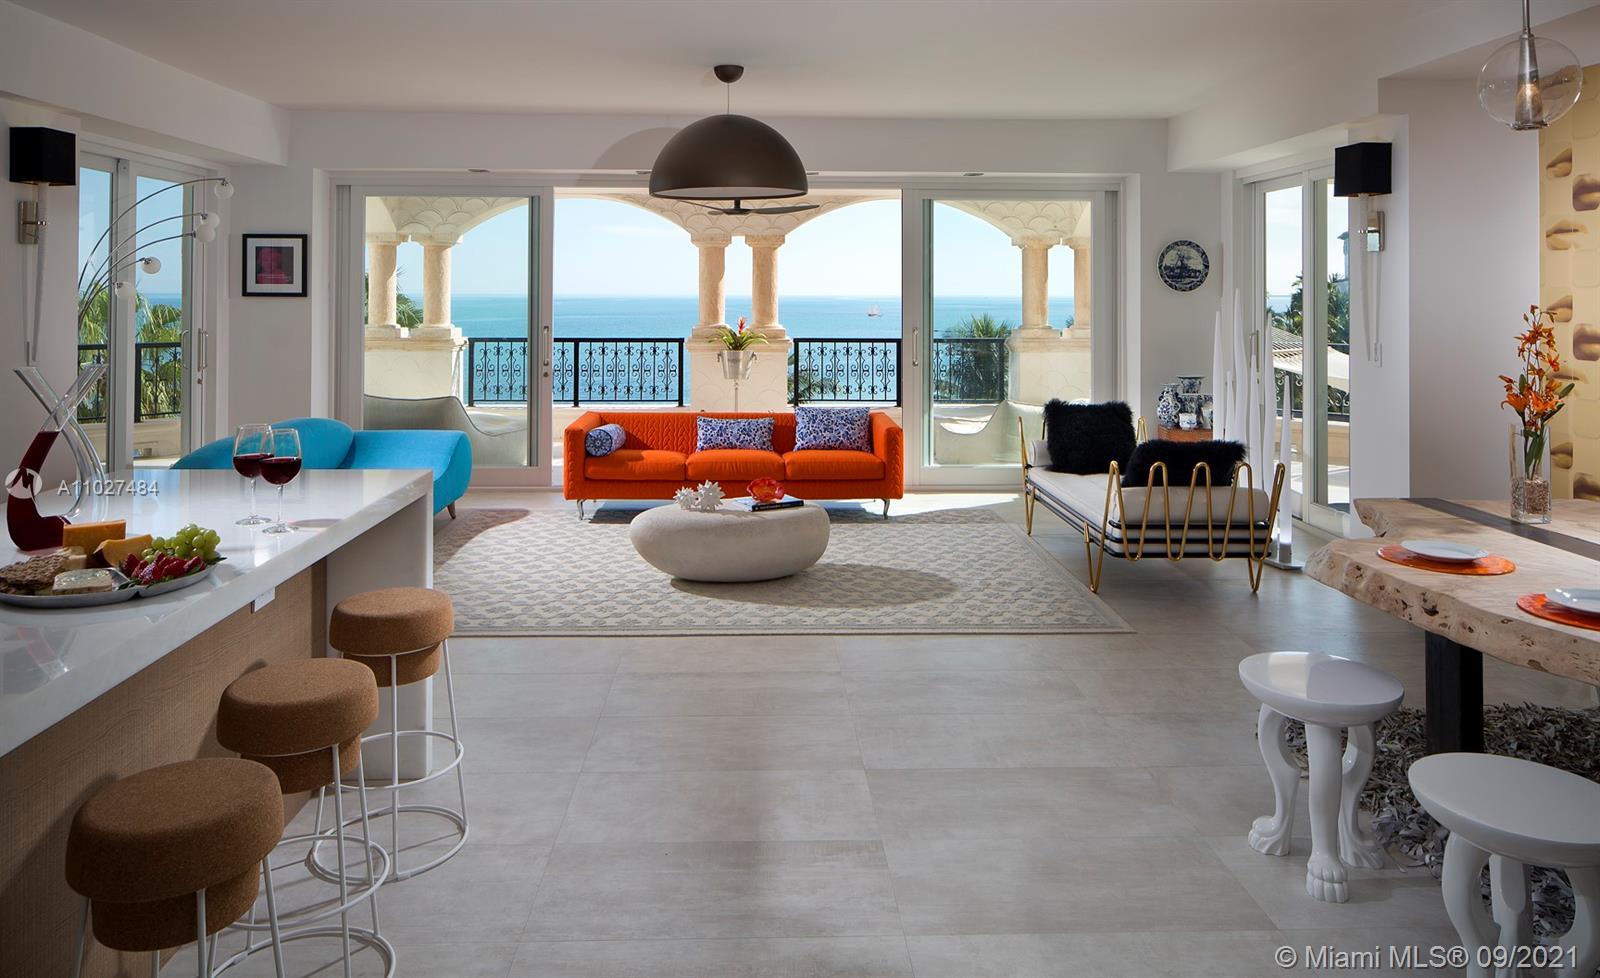 7745 Fisher Island Dr Unit 7745, Miami Beach, Florida 33109